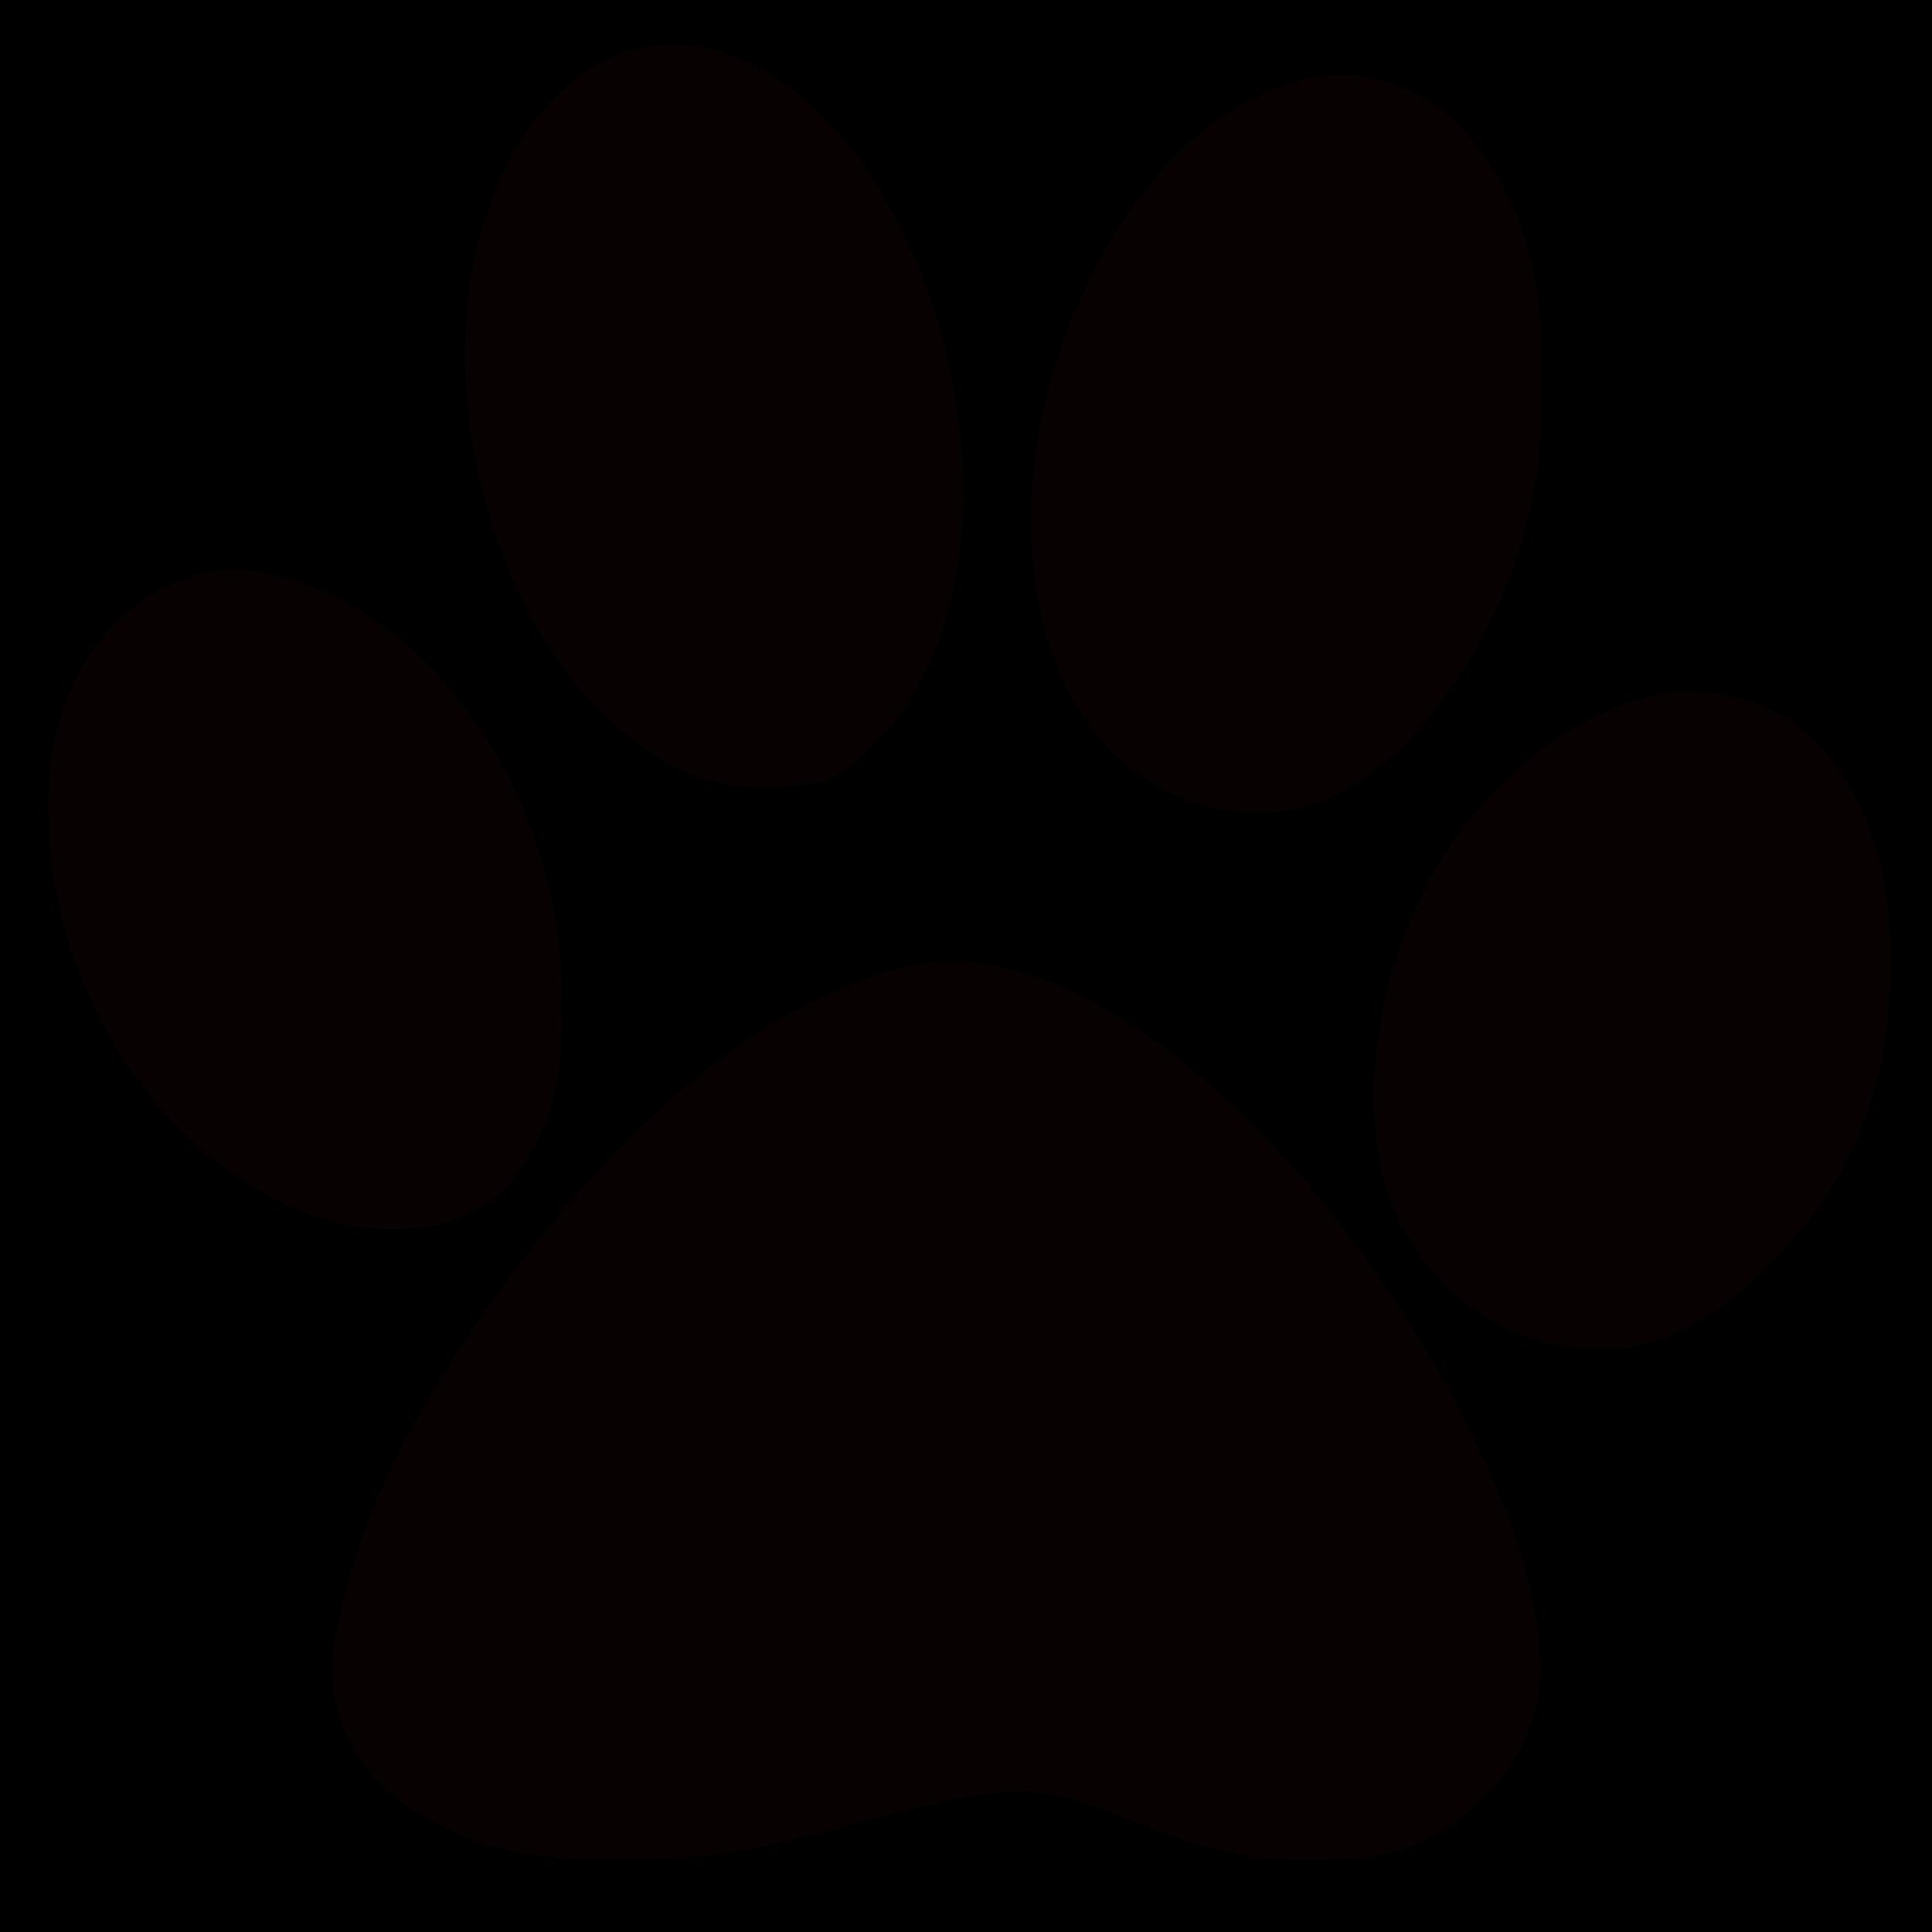 2500x2500 Panther Paw Print Clip Art